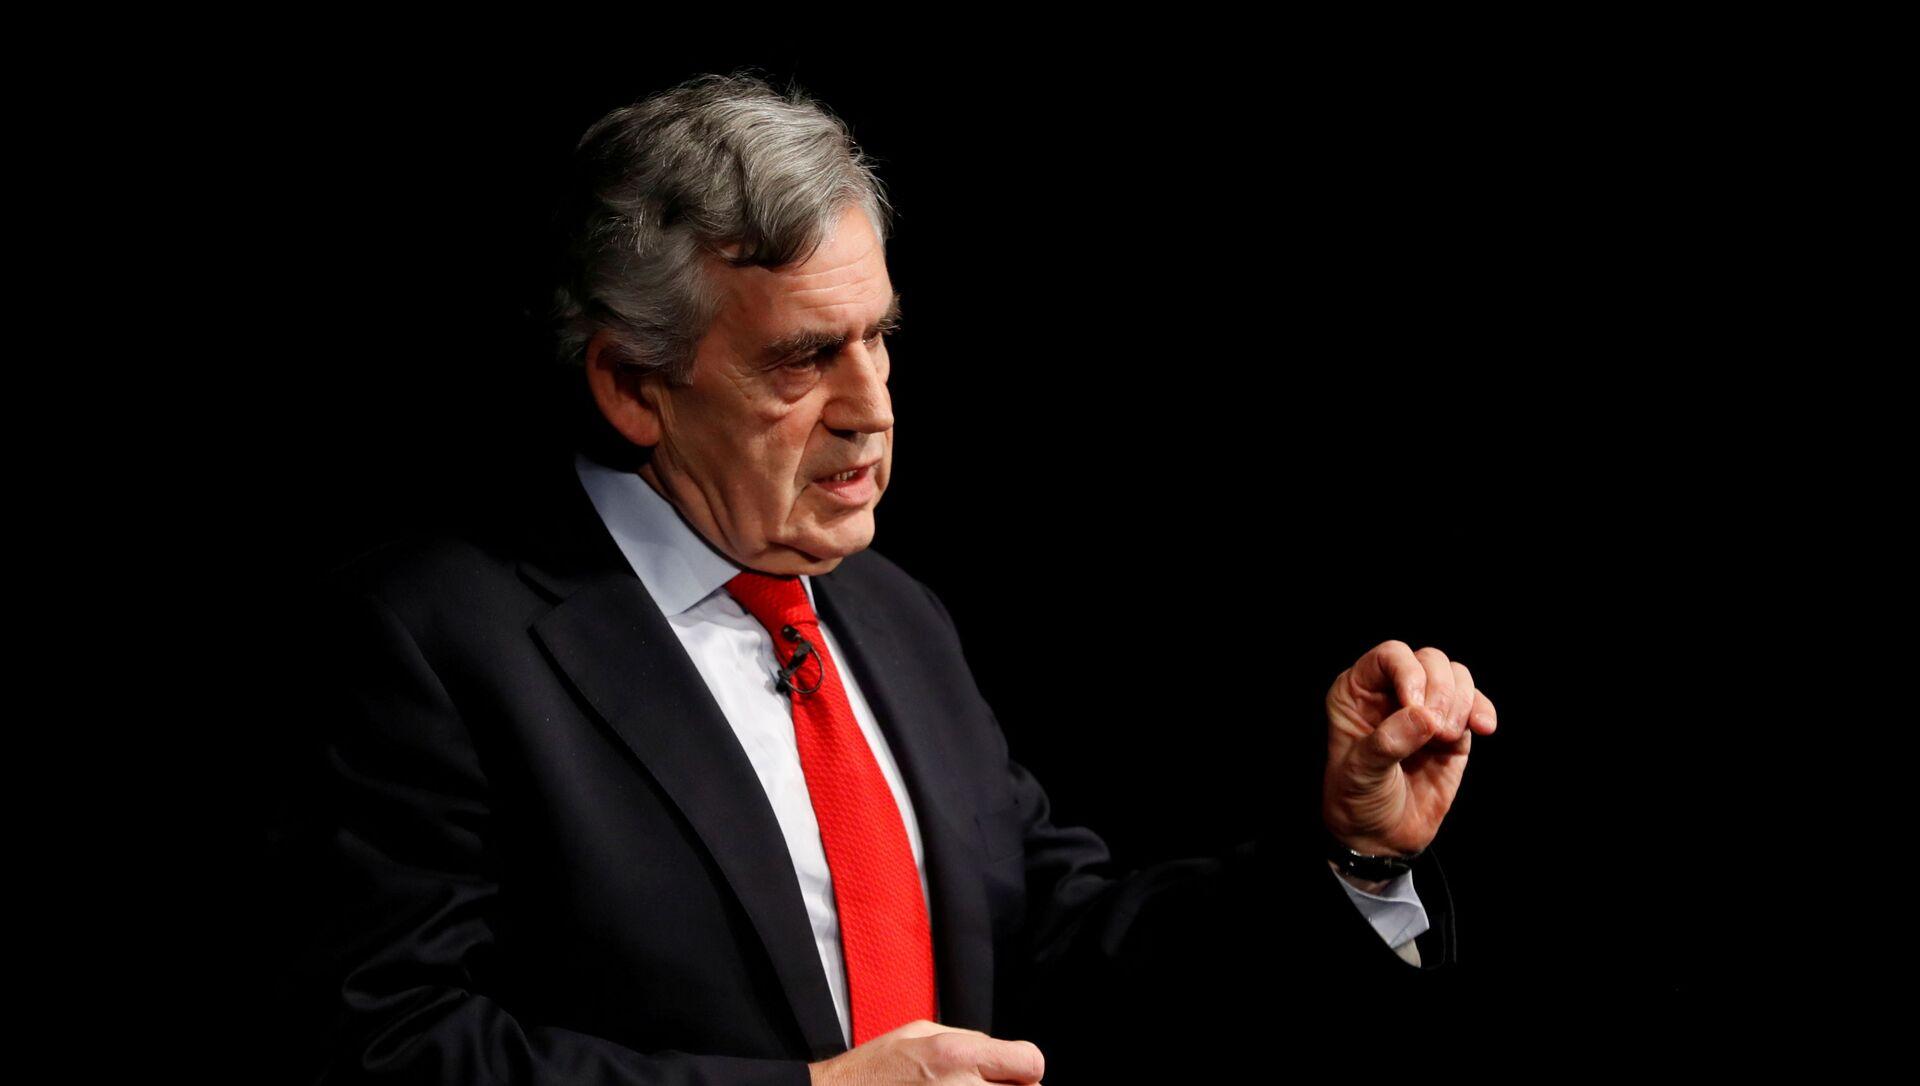 Britain's former Prime Minister Gordon Brown speaks at an event in Edinburgh, Scotland, Britain January 17, 2019 - Sputnik International, 1920, 16.08.2021